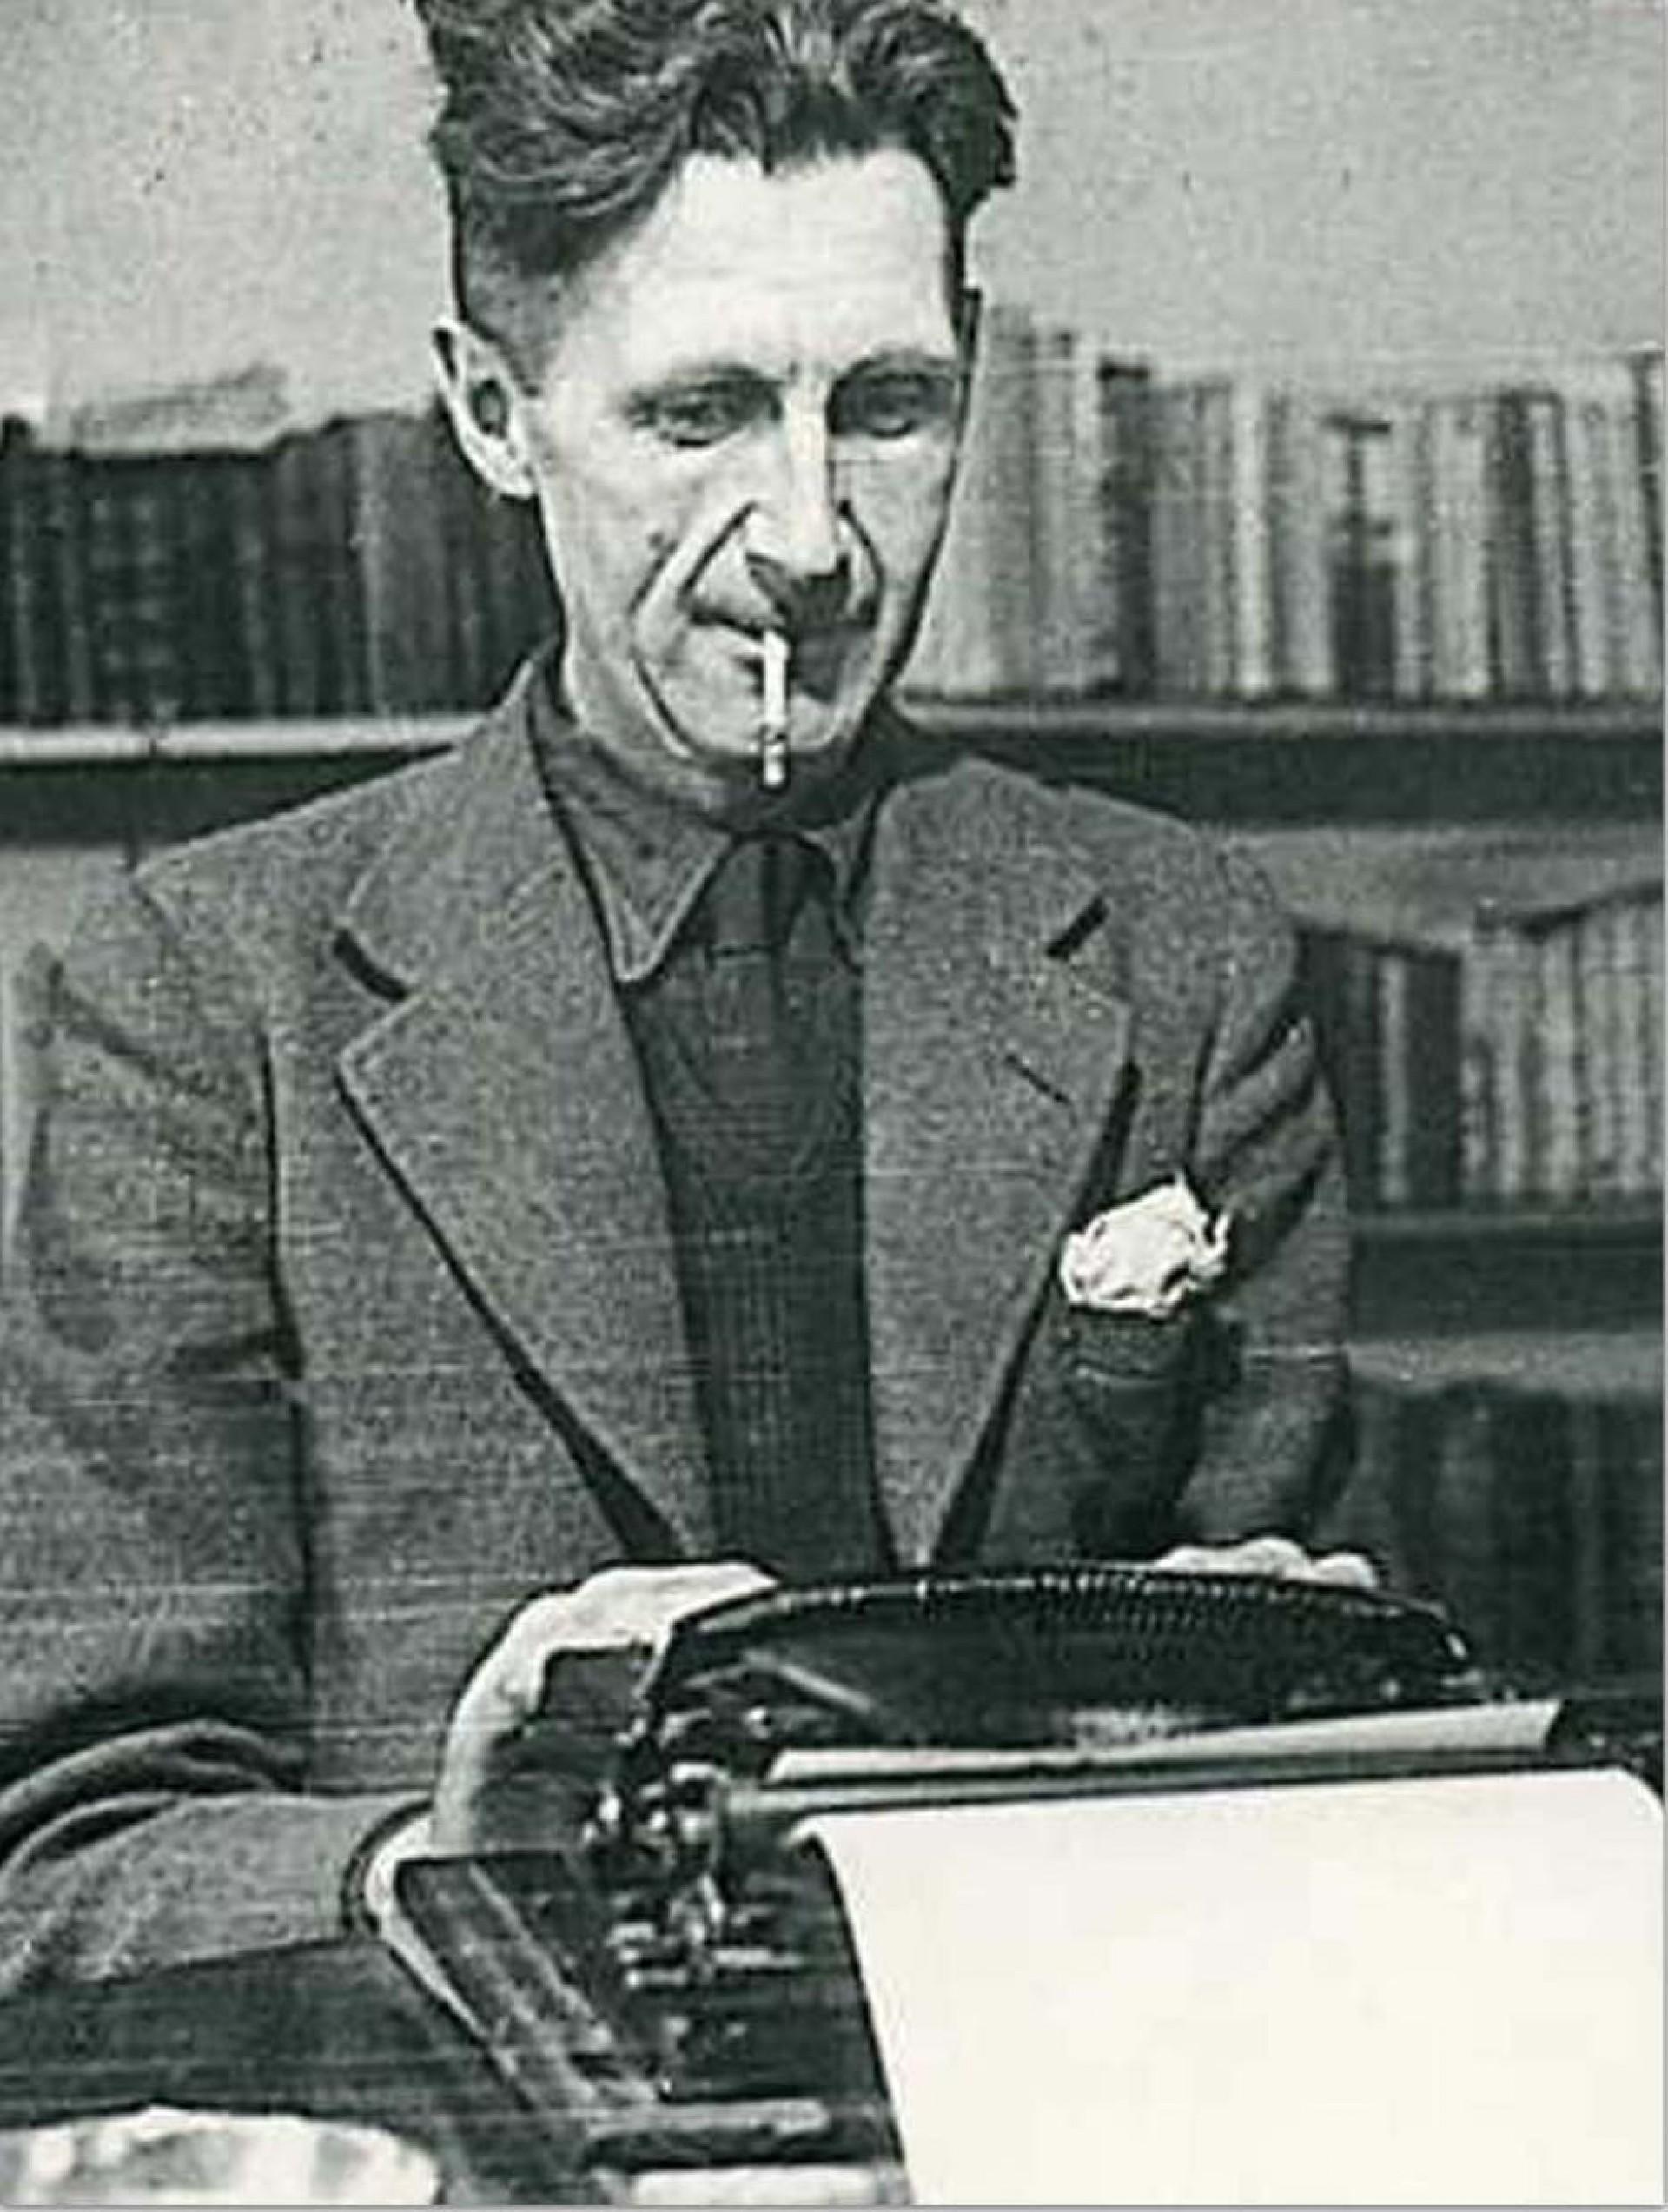 003 Essay Example George Orwell Frightening Essays Everyman's Library Summary Bookshop Memories 1920